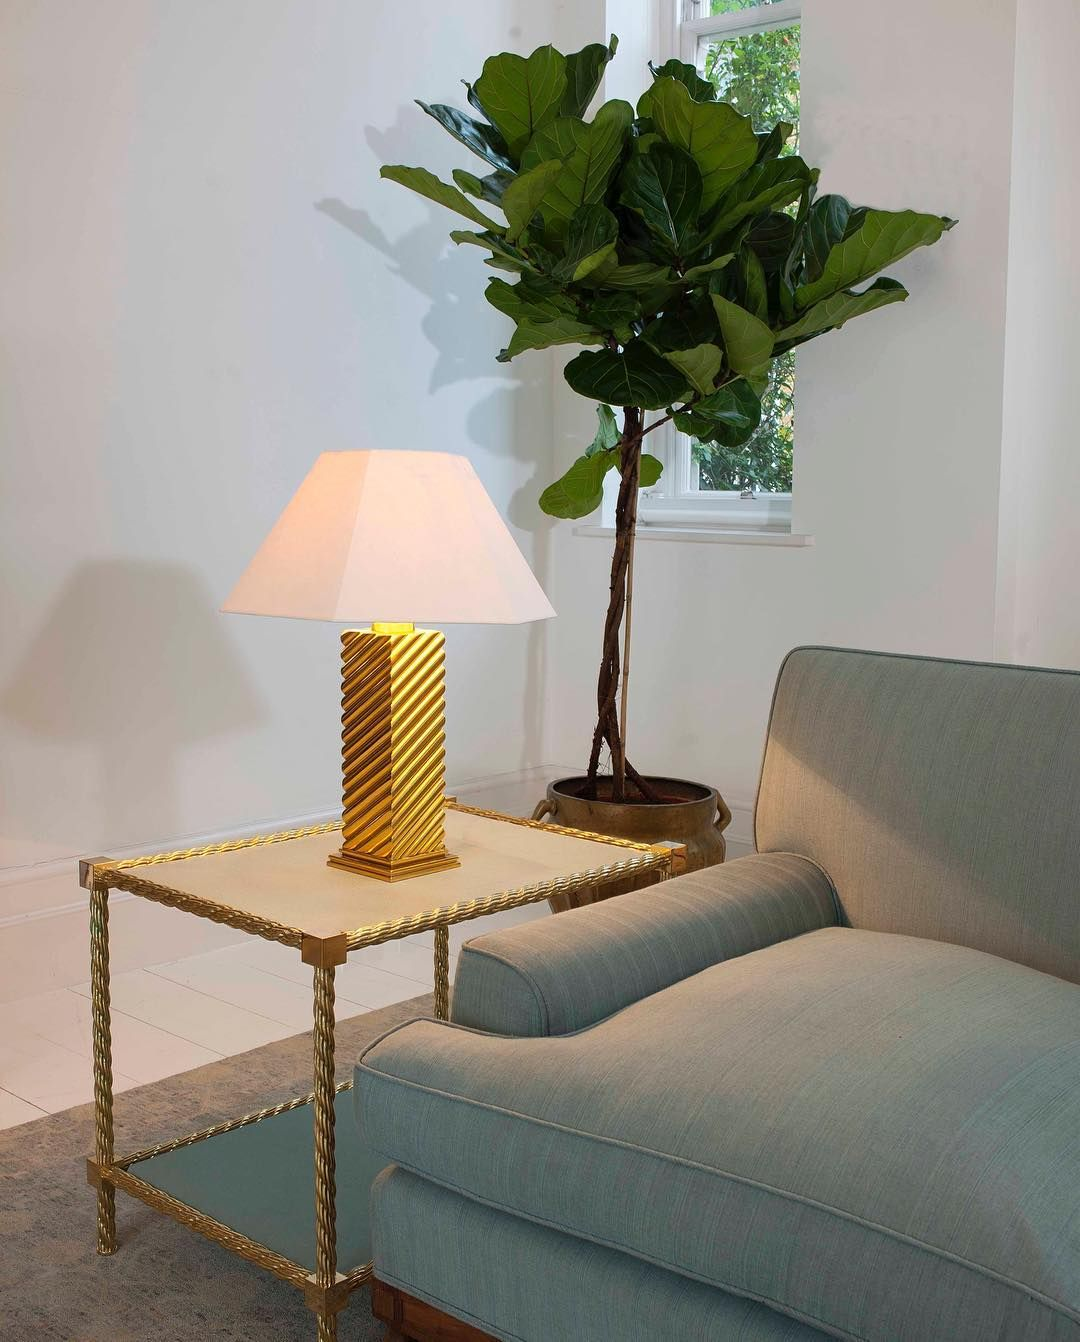 The Glamorous Grissini Lamp With Bold Three Dimensional Chevron Design Madeinbritain Lighting Tablelamp In 2020 Table Lamp Lamp Chevron Design